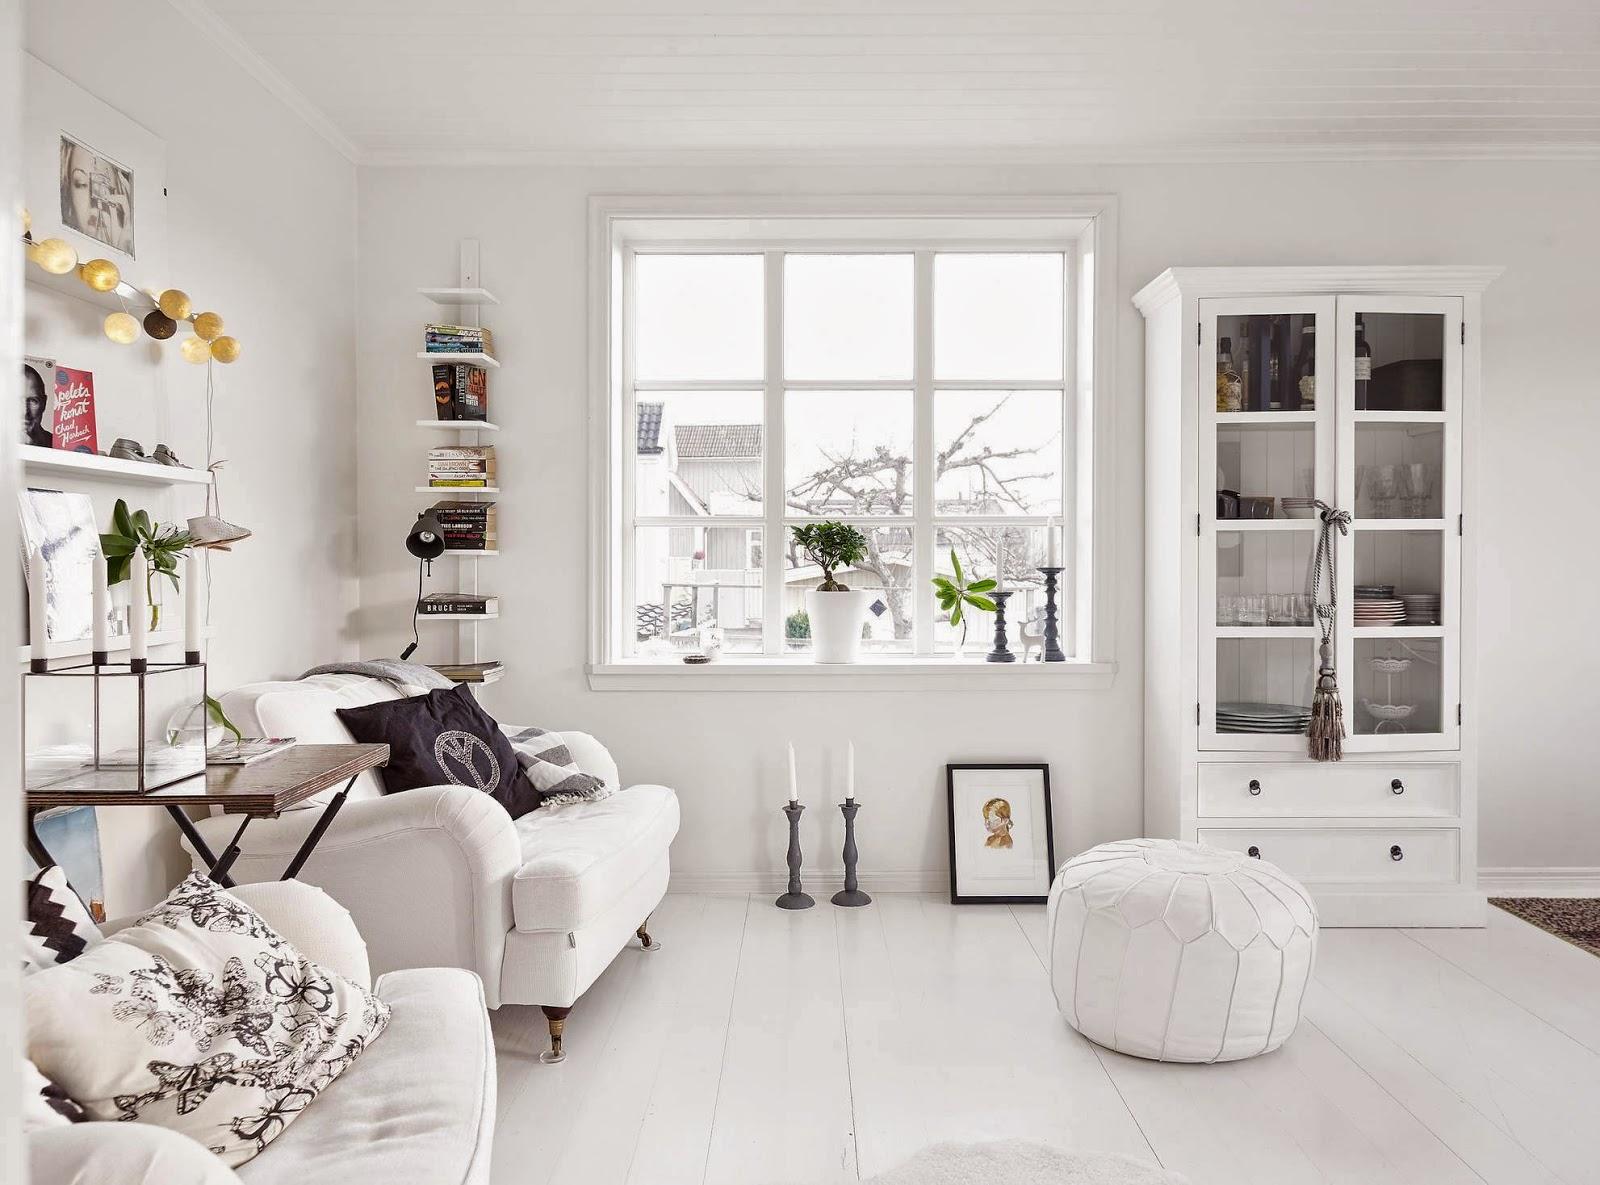 decordemon: Cozy, simple and white Nordic house